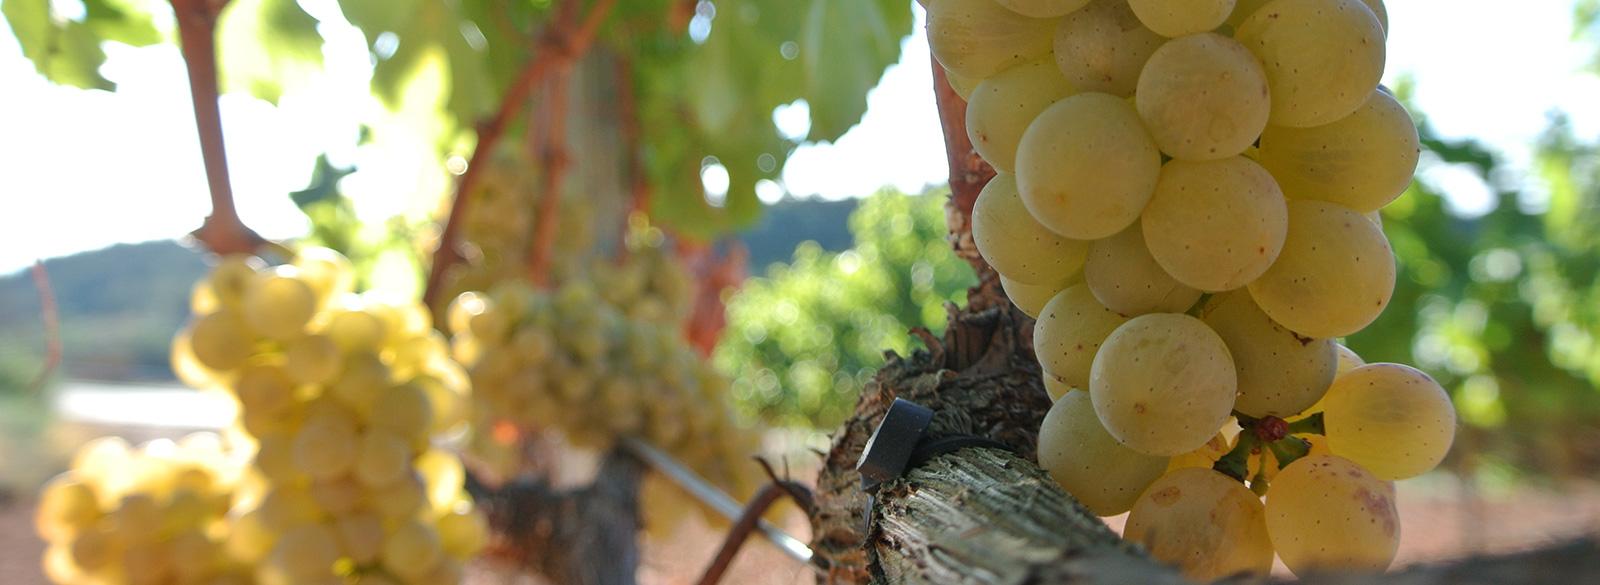 Así es la Albillo Mayor, la uva de los blancos de la DO Ribera del Duero